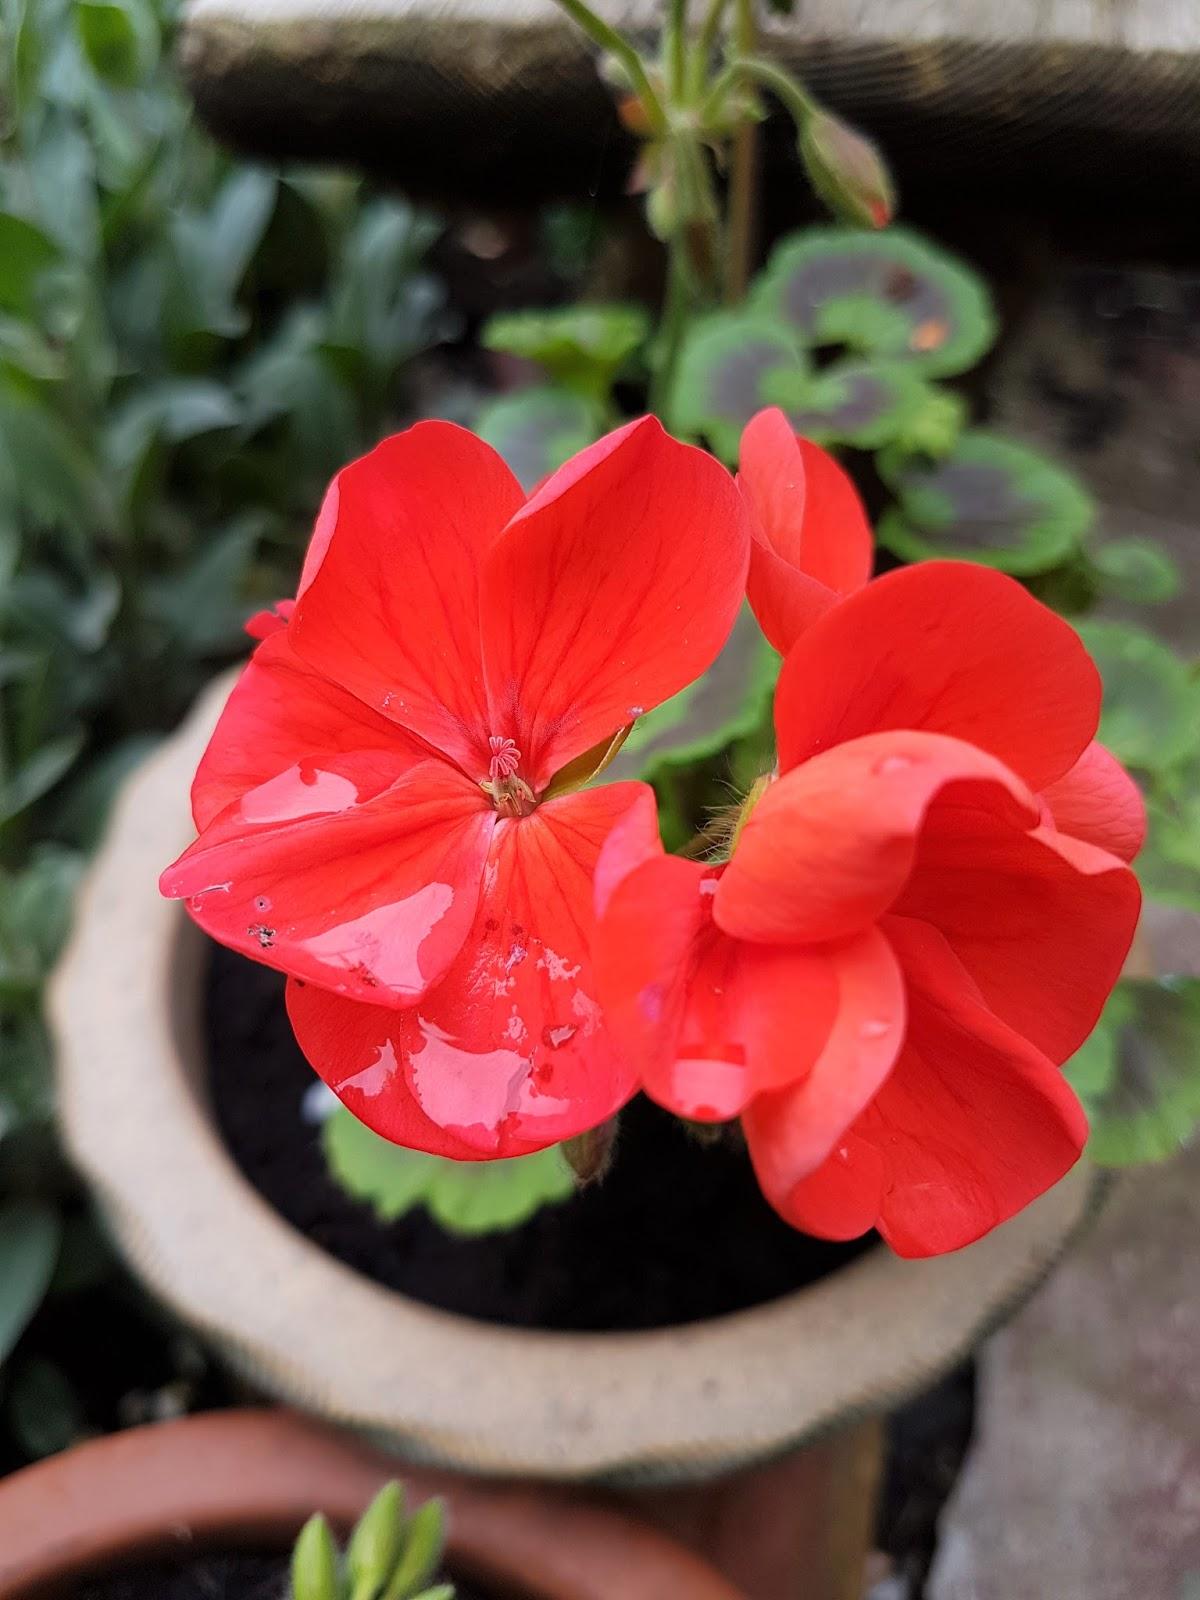 Geranium: useful properties